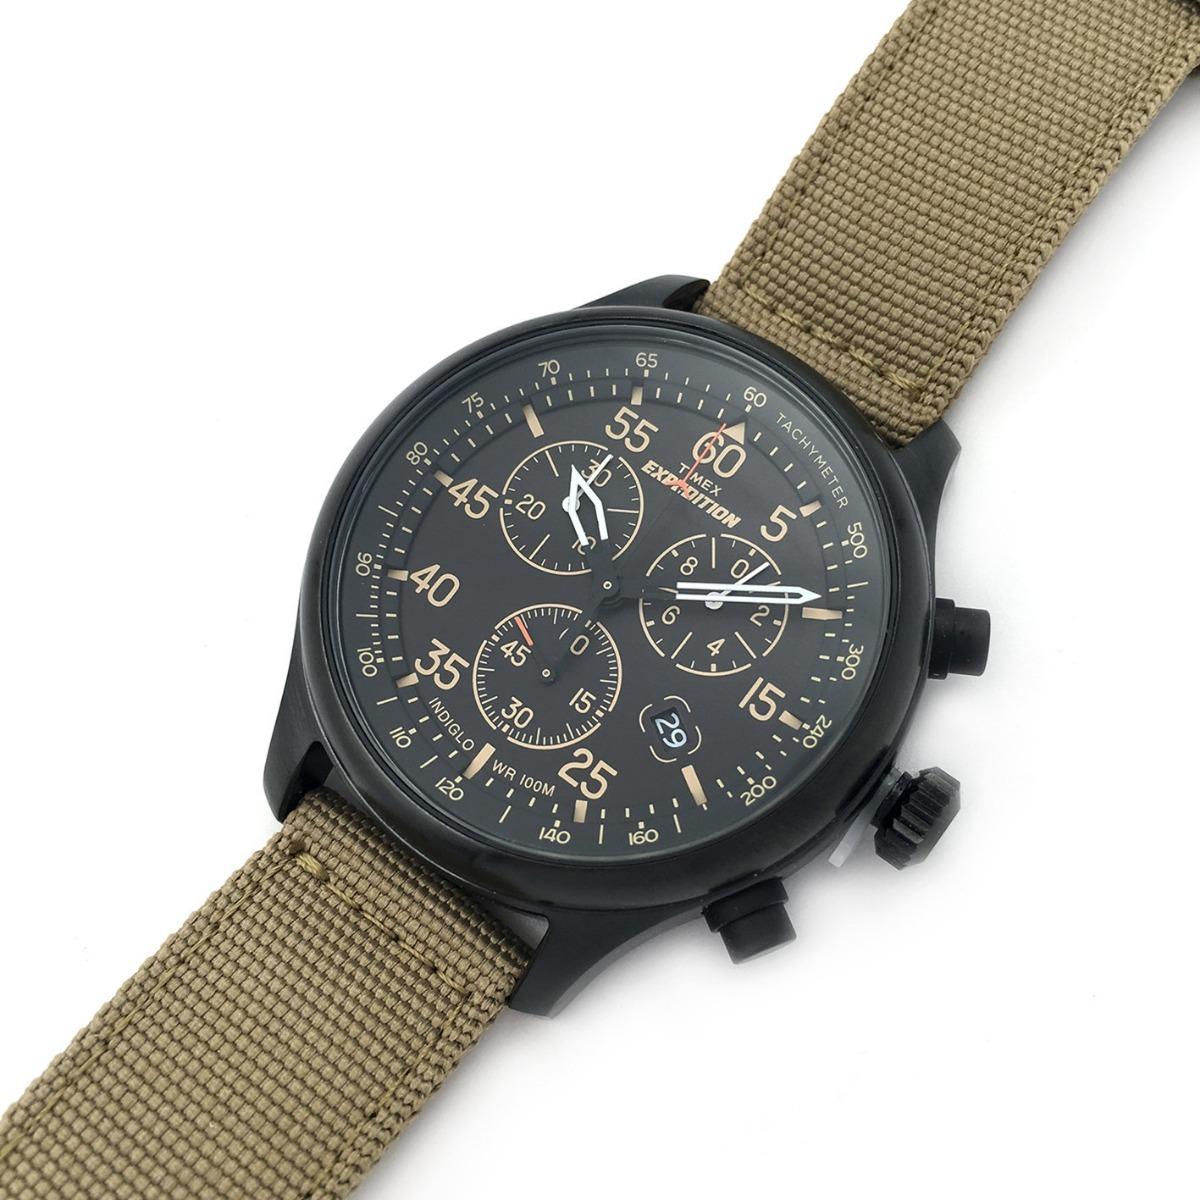 98010ac8bde relogio timex expedition cronografo t49905 tn frete gratis. Carregando zoom.